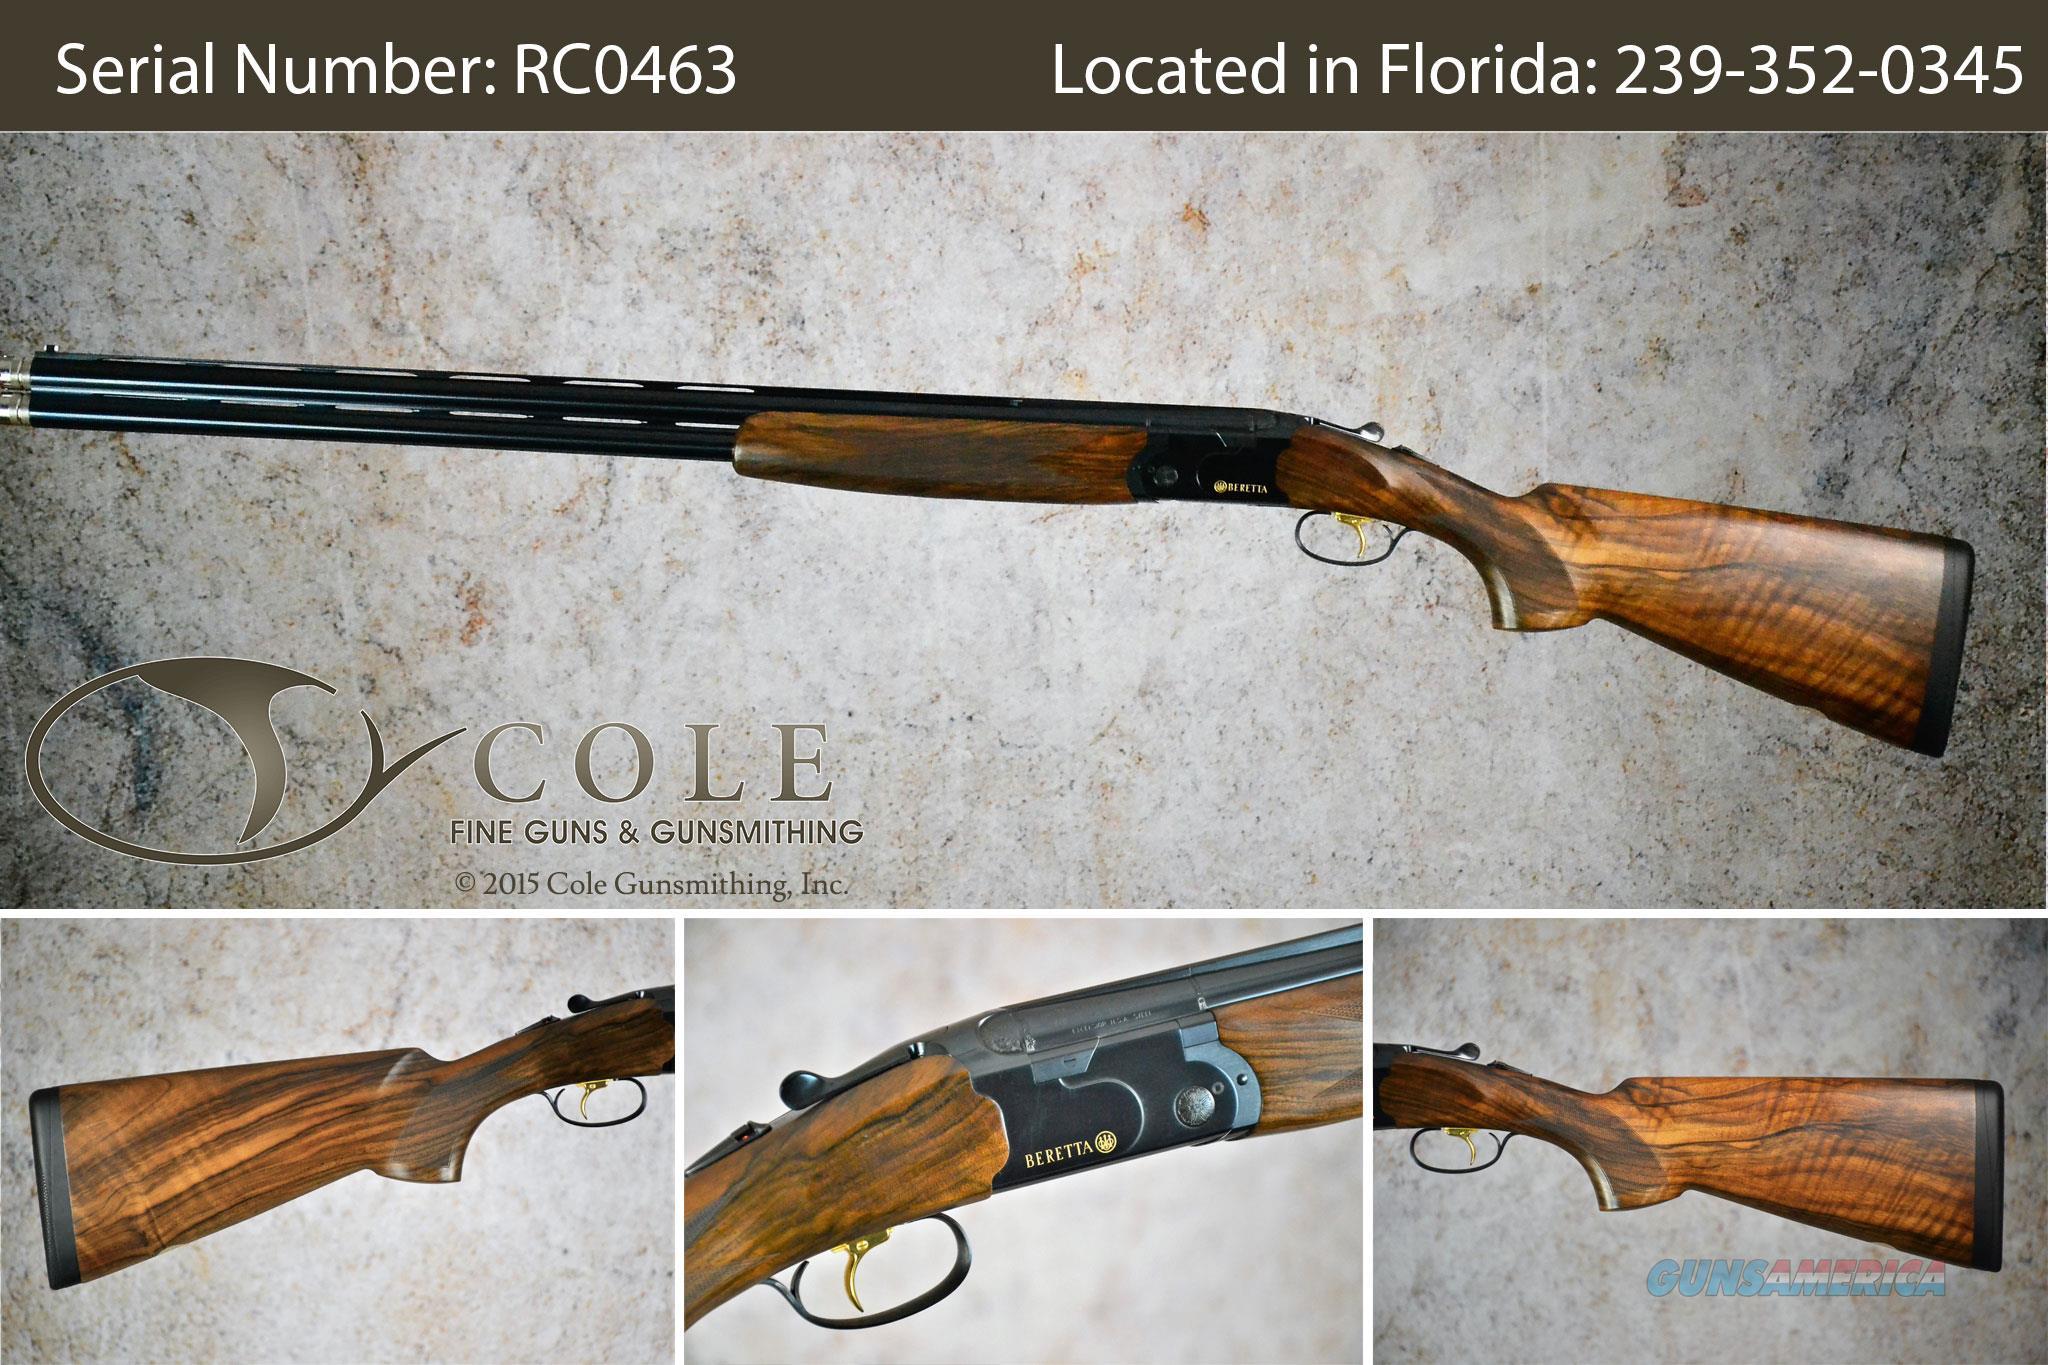 "Beretta 686 Cole Special Sporting 12g 30"" SN:#RC0463  Guns > Shotguns > Beretta Shotguns > O/U > Trap/Skeet"